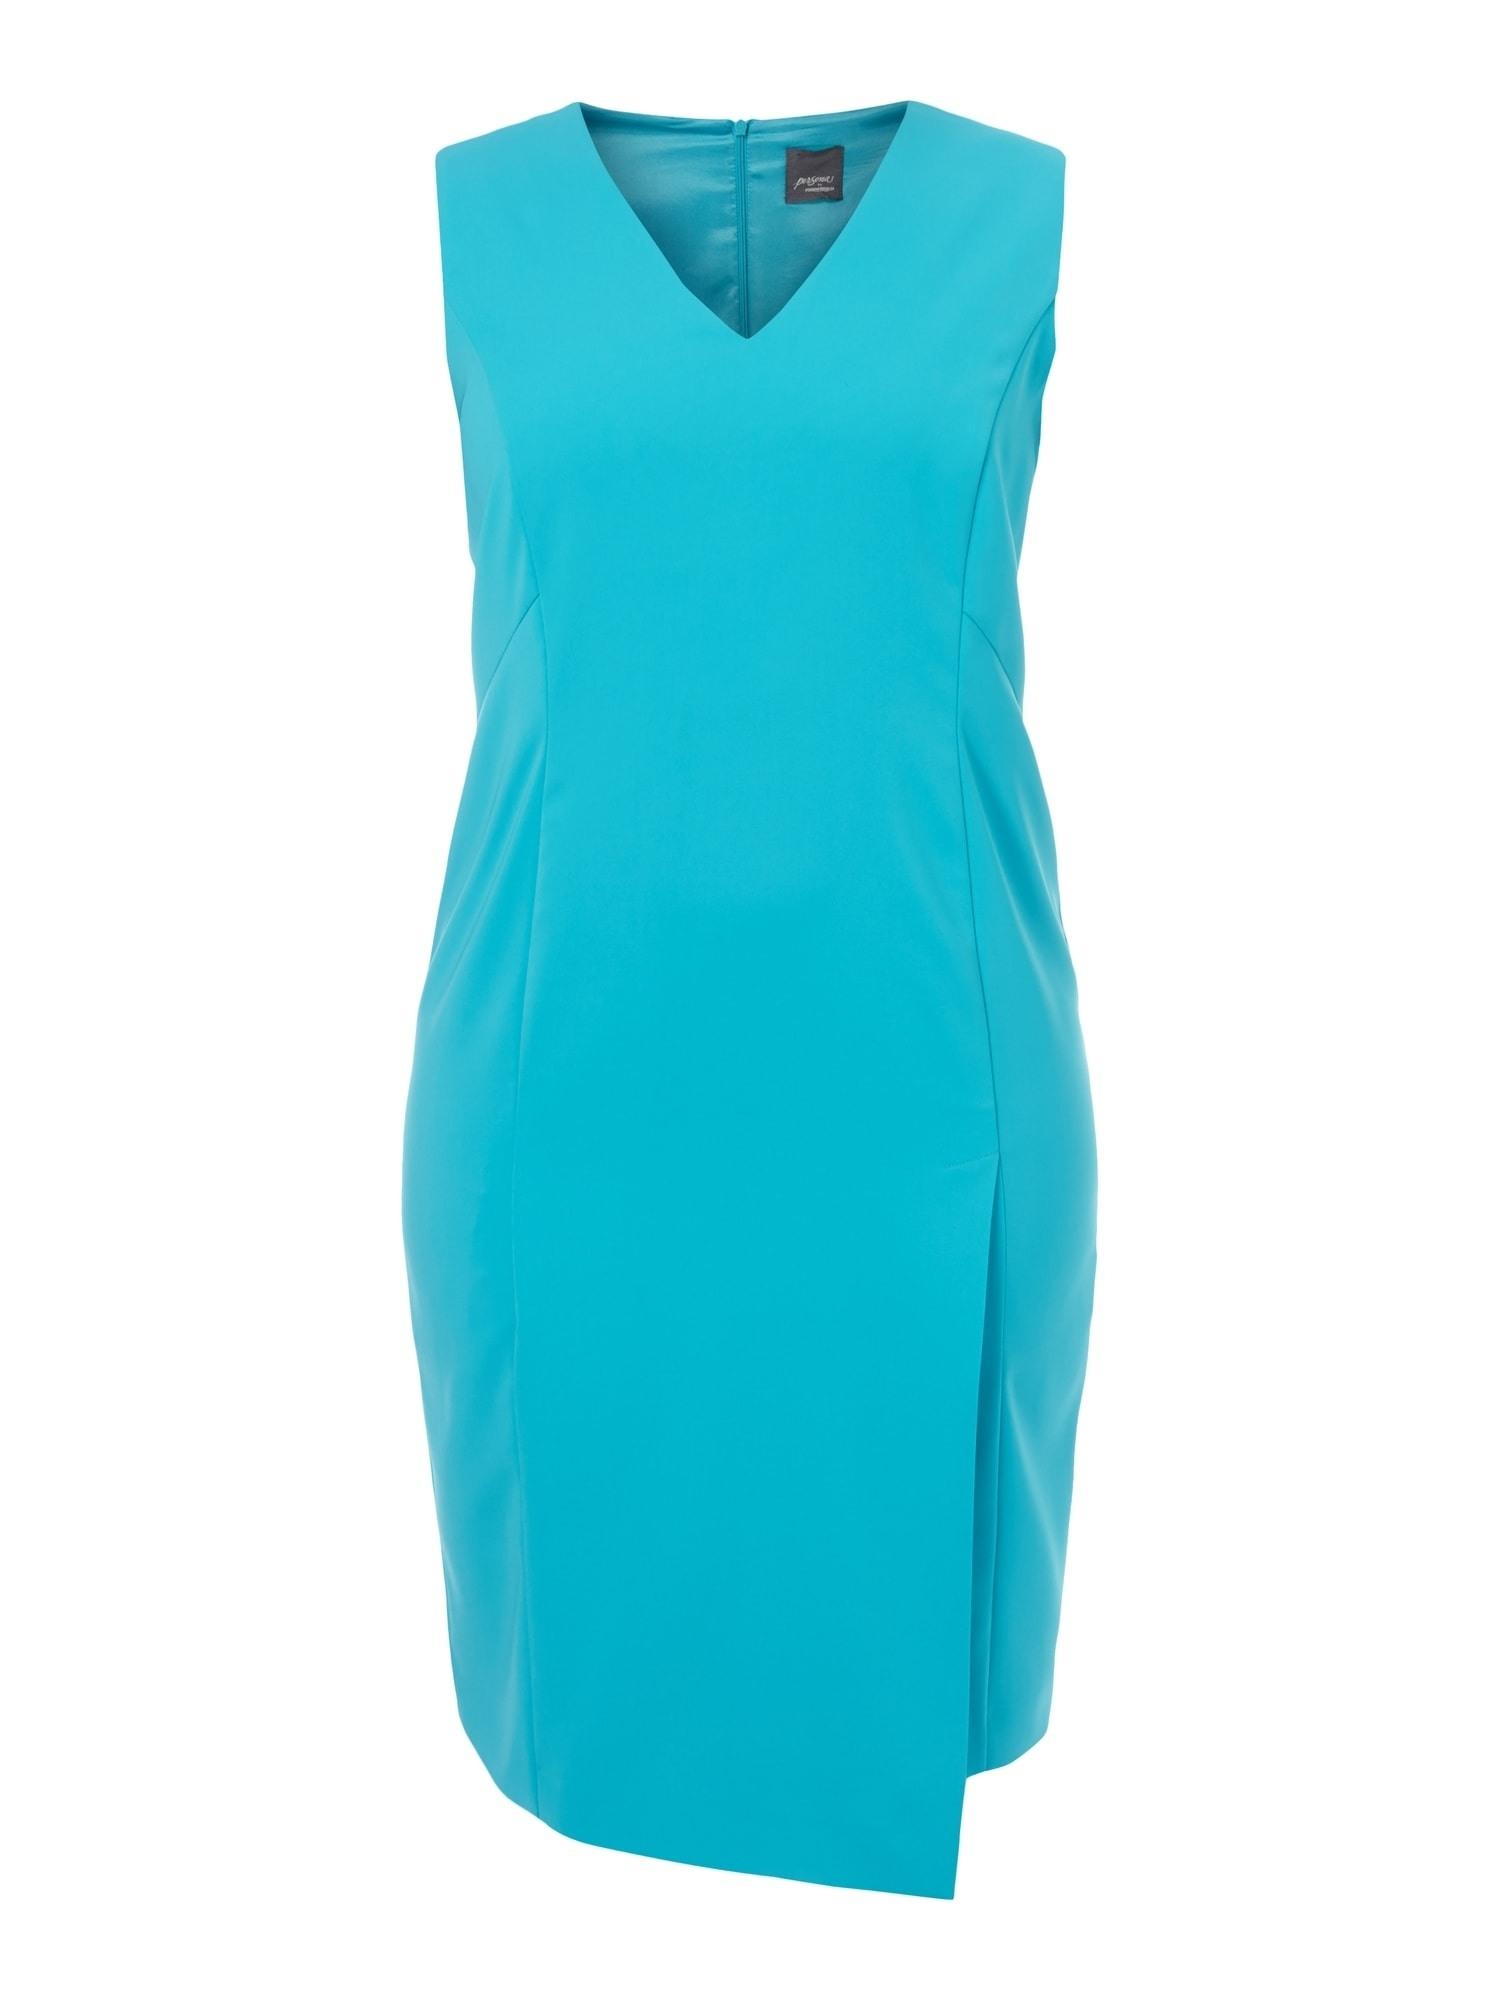 15 Luxus Kleid Türkis Damen Ärmel20 Cool Kleid Türkis Damen Spezialgebiet